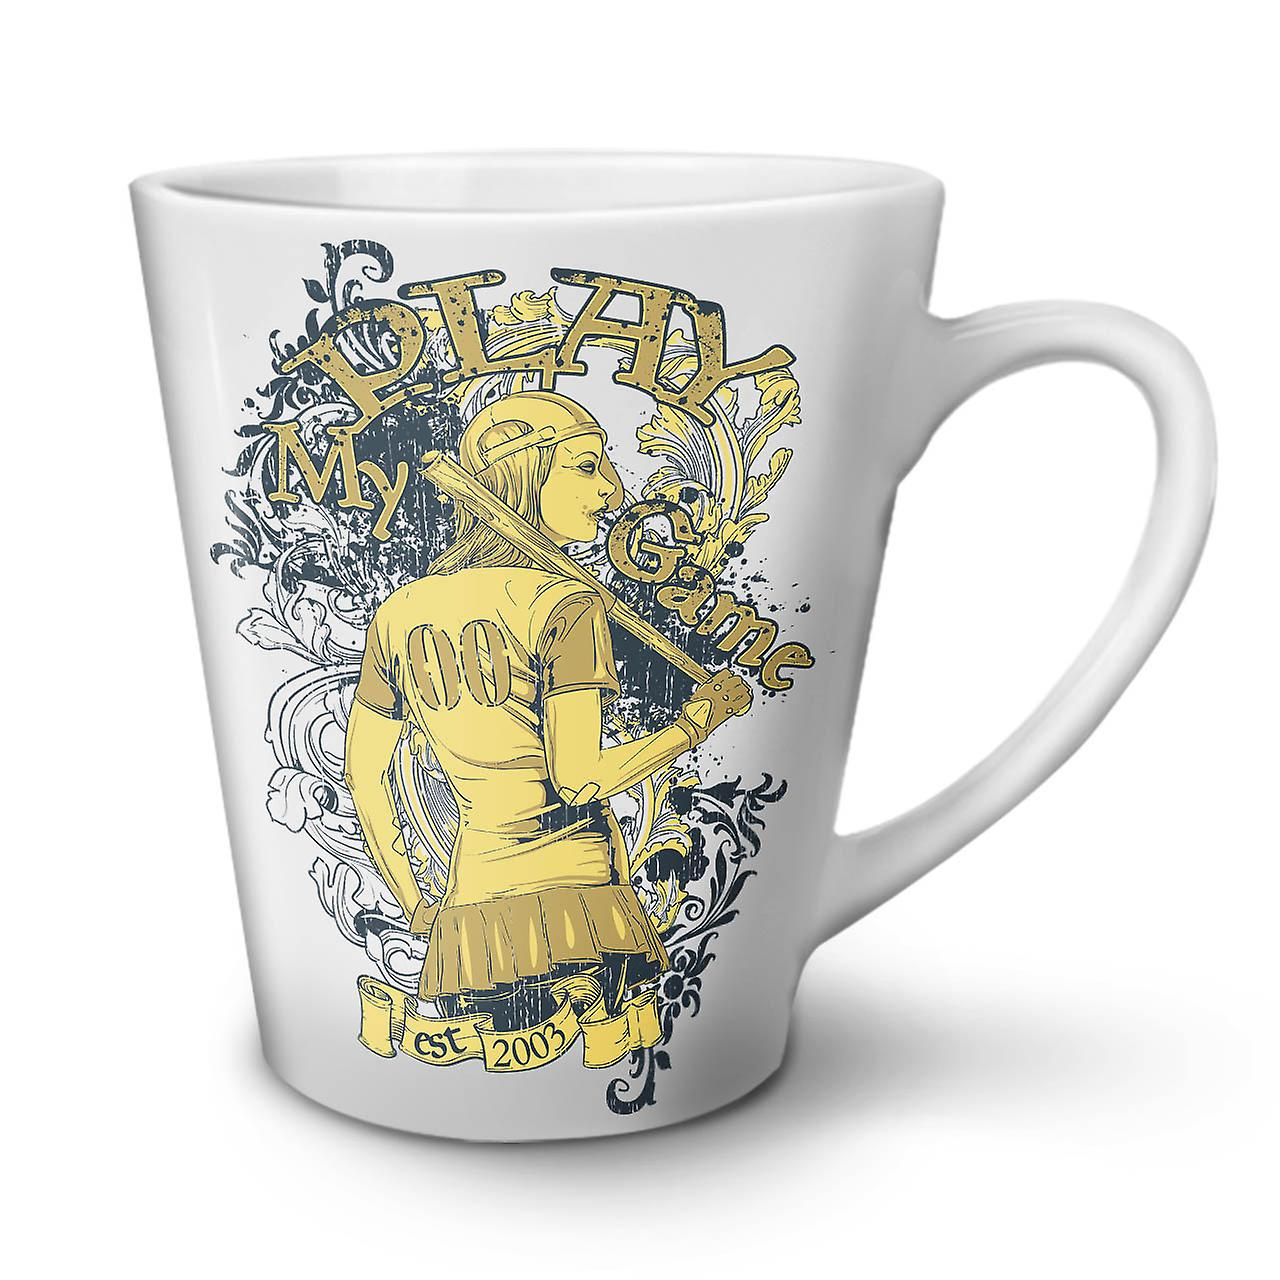 Latte OzWellcoda Le Mug 12 Jouer Blanc Céramique Sport Café Baseball En Jeu De Nouveau Thé dorxBeEQCW